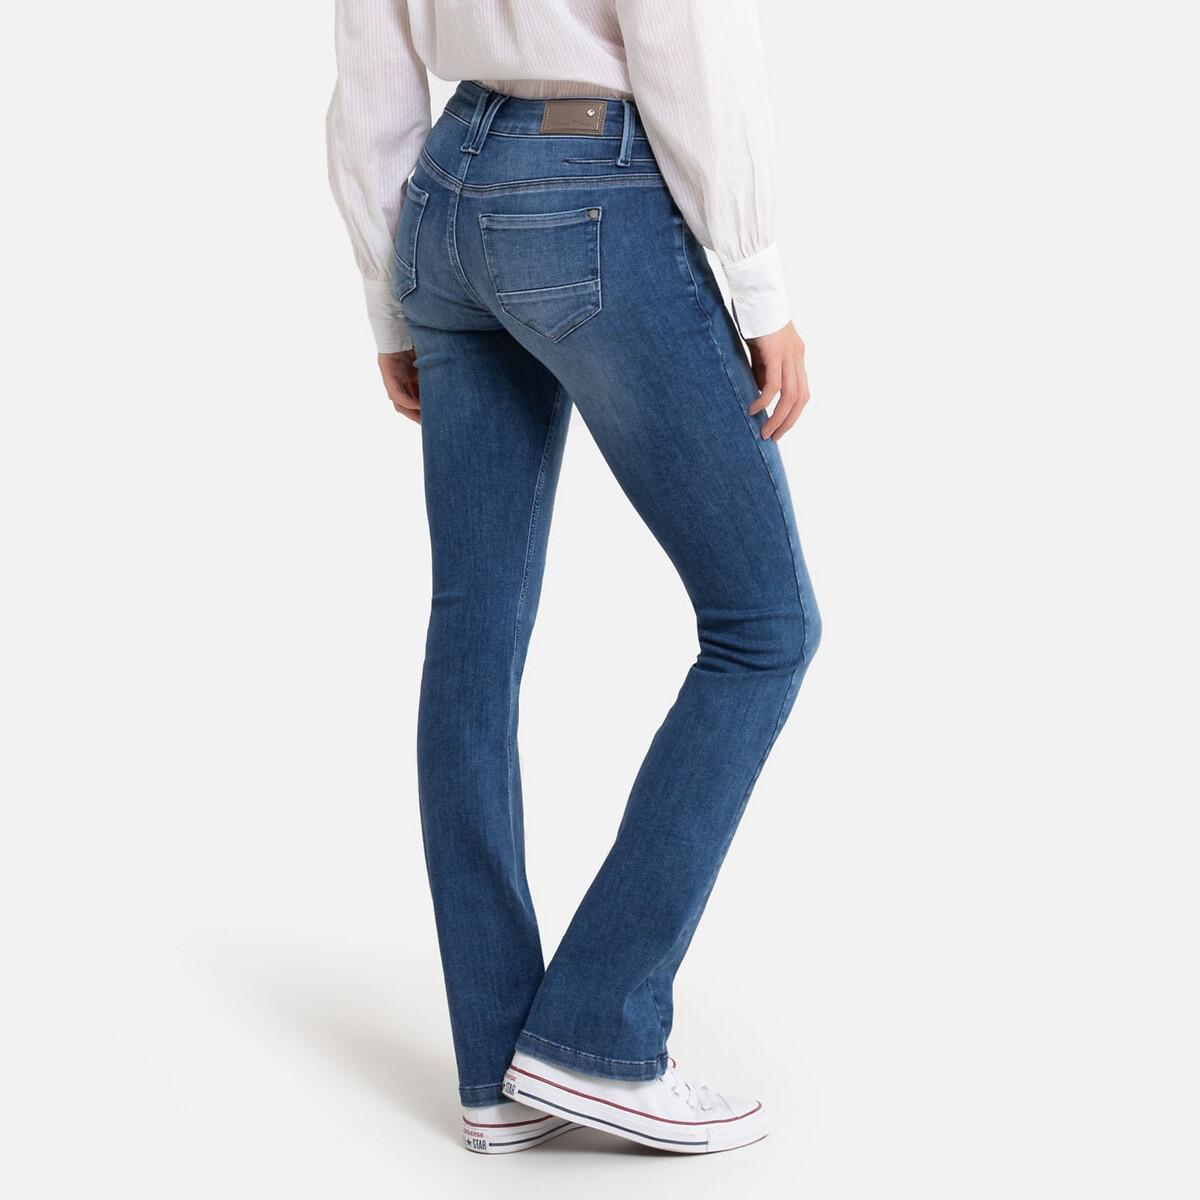 Jeans Bootcut Betsy S-SDM, cintura subida